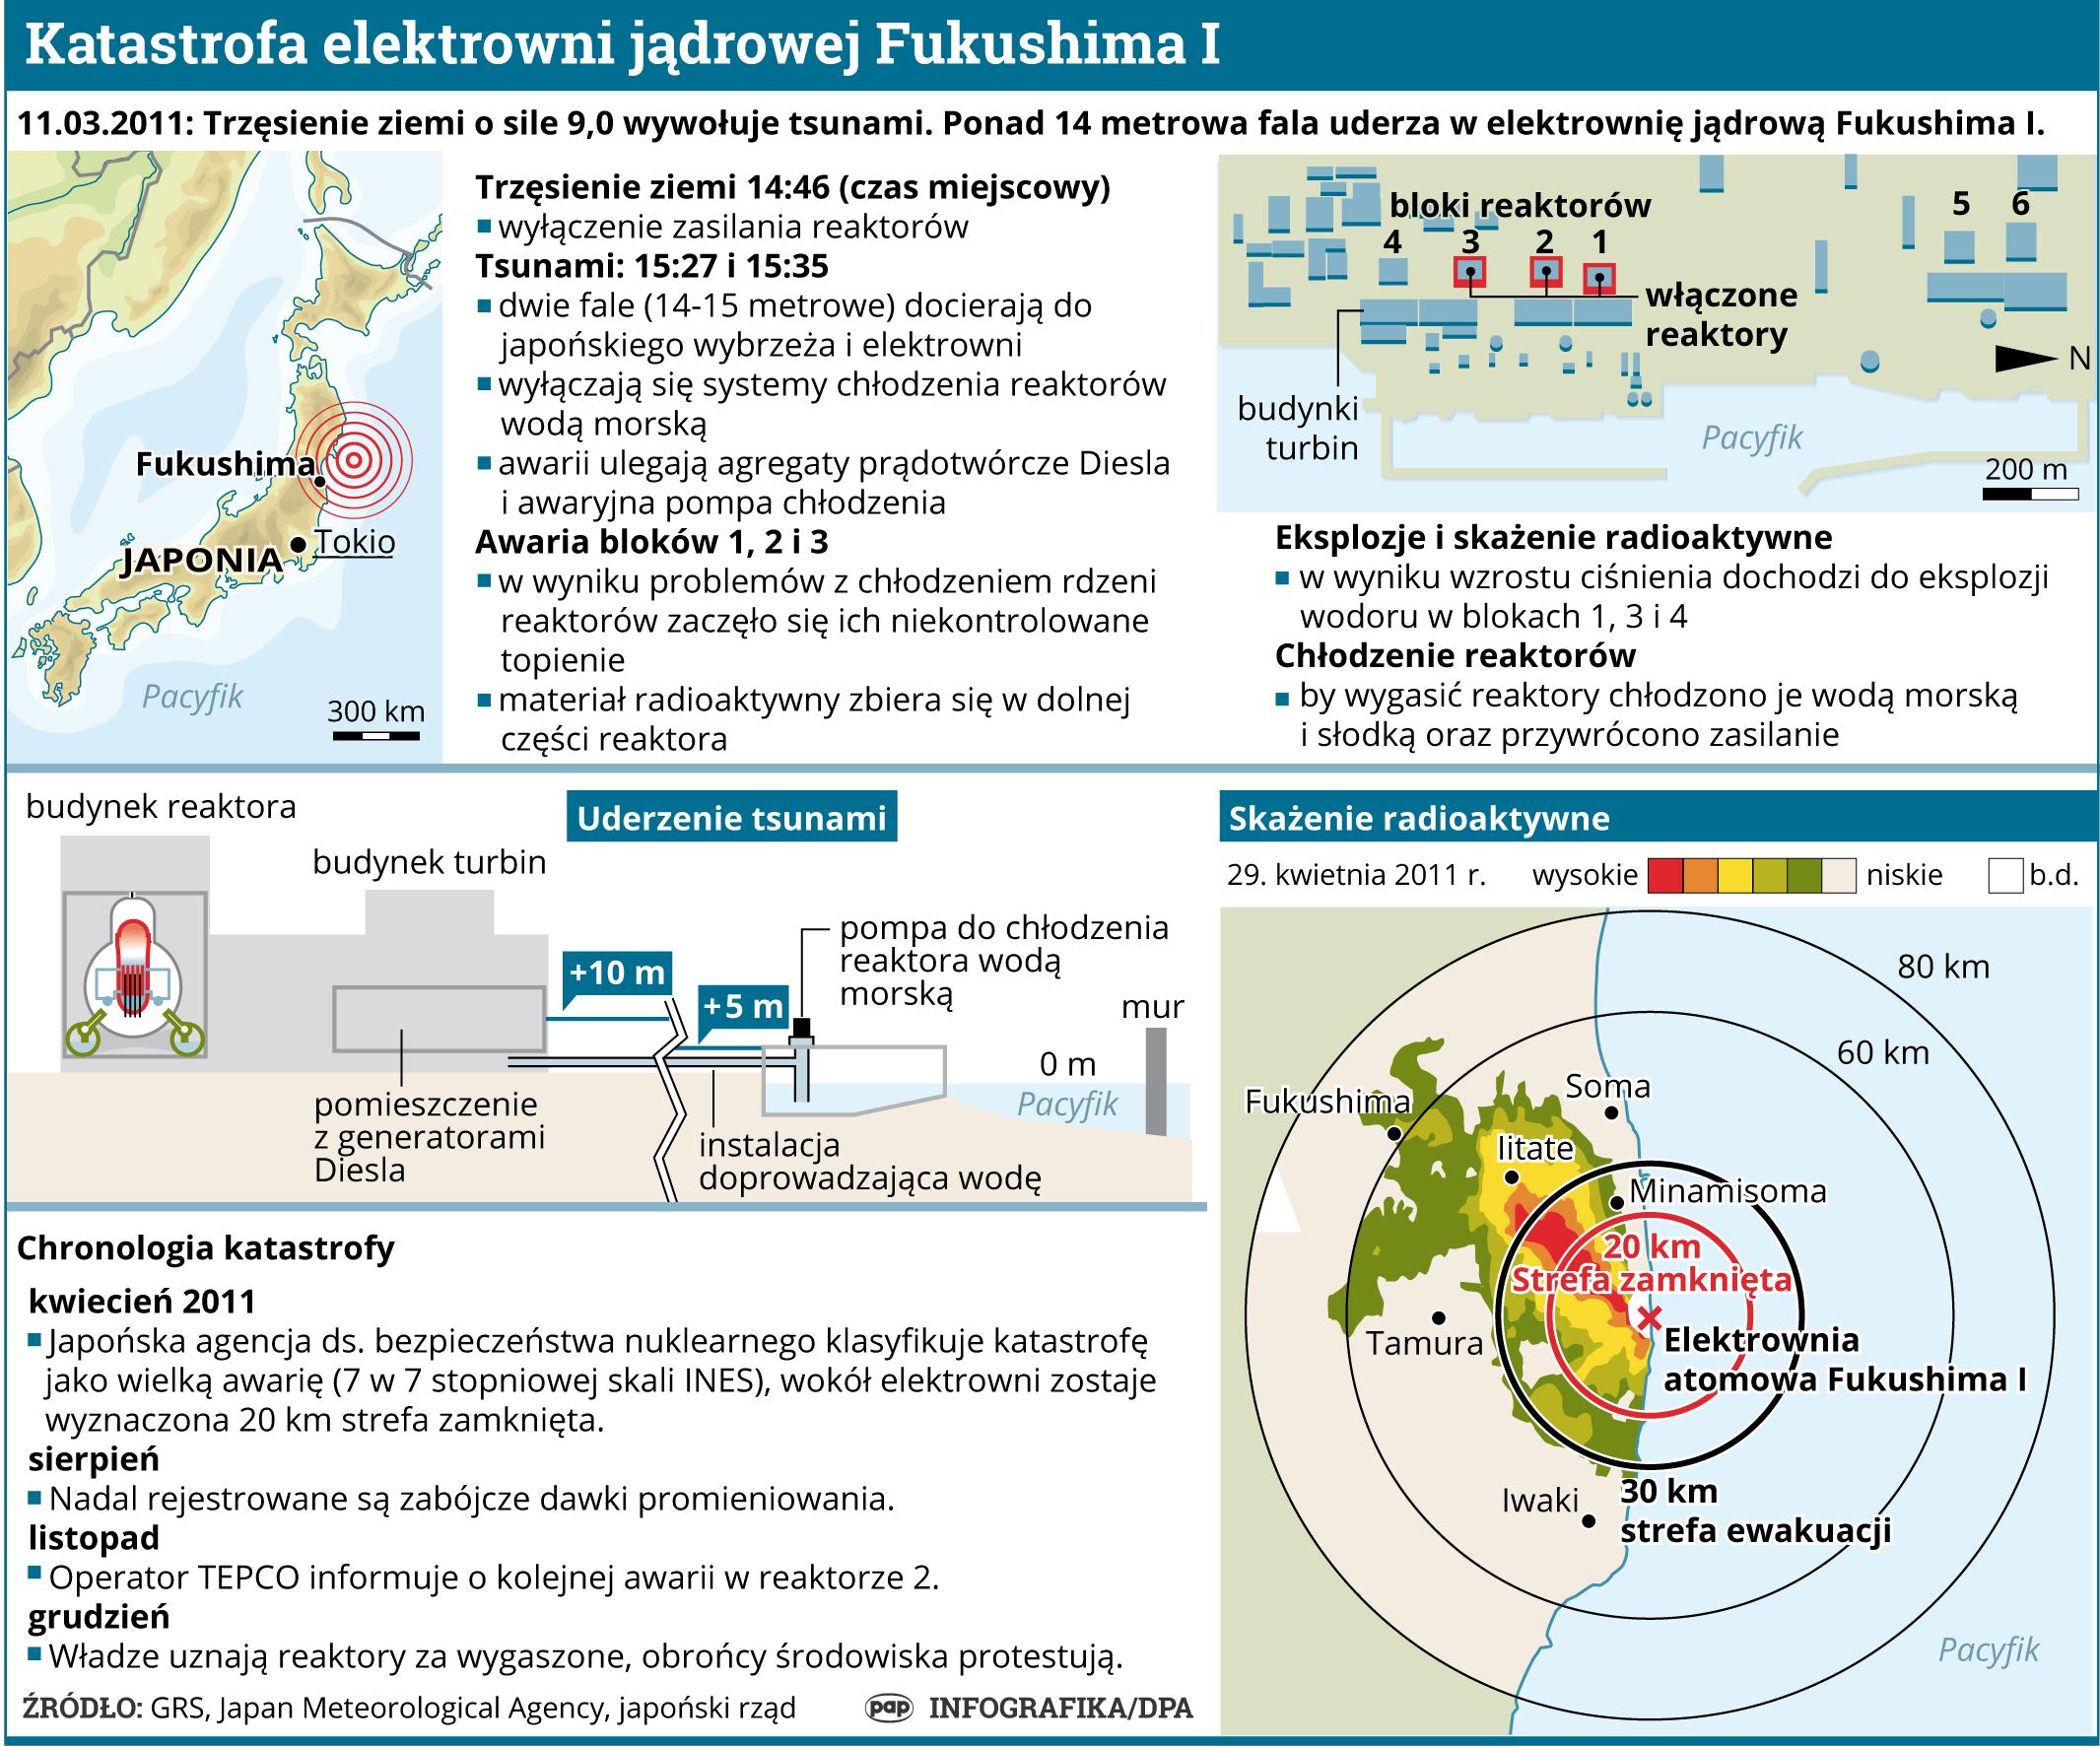 Katastrofa elektrowni jądrowej Fukushima I